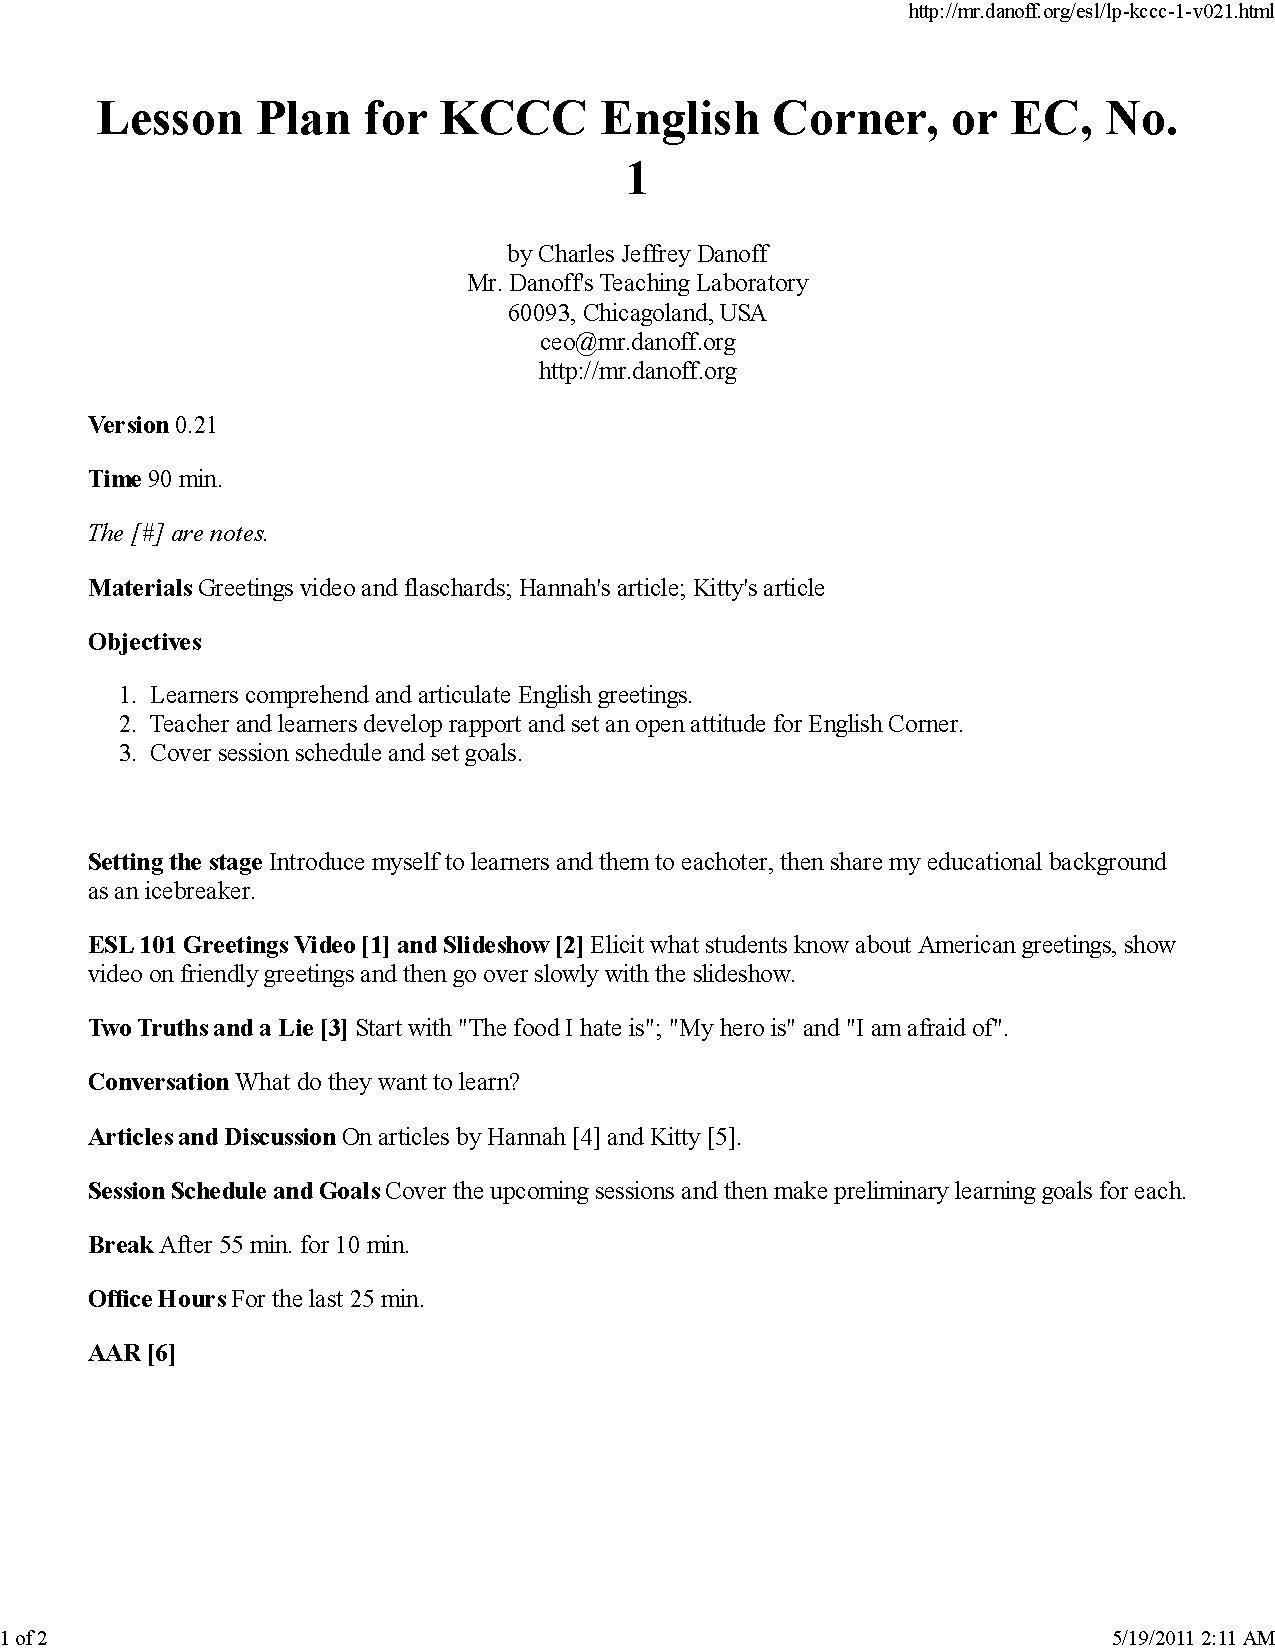 Filelesson Plan For Kccc English Corner Or Ec No 1pdf Wikiversity